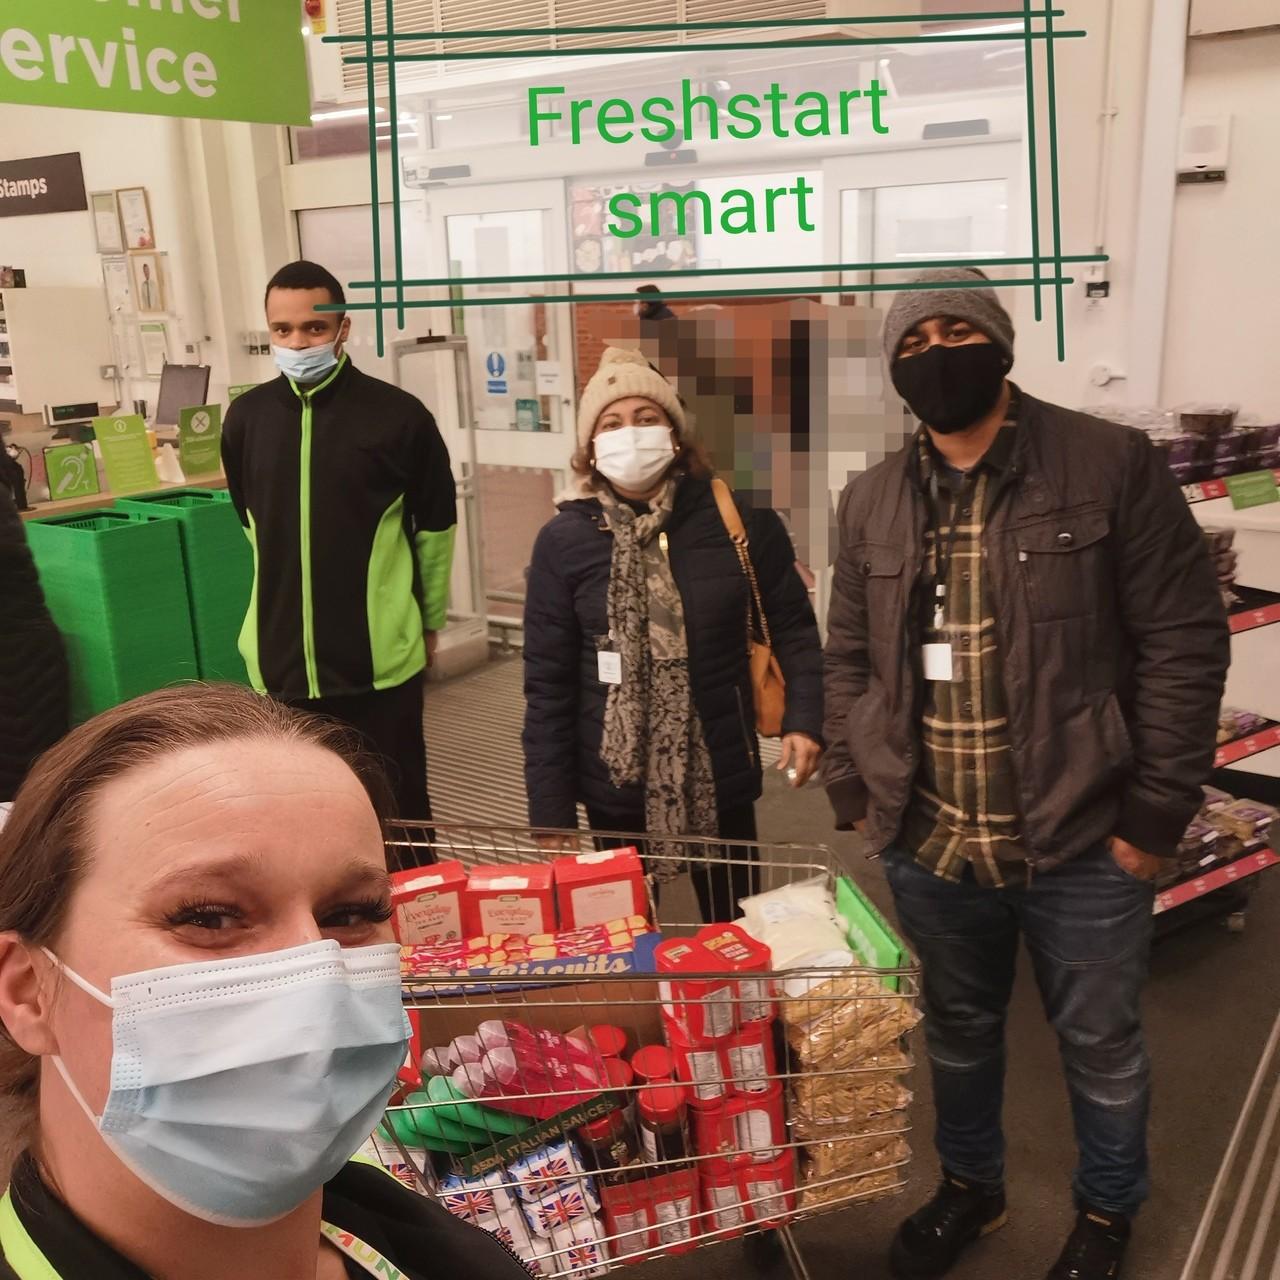 A donation of essential food items to FreshStart Smart | Asda Wythenshawe